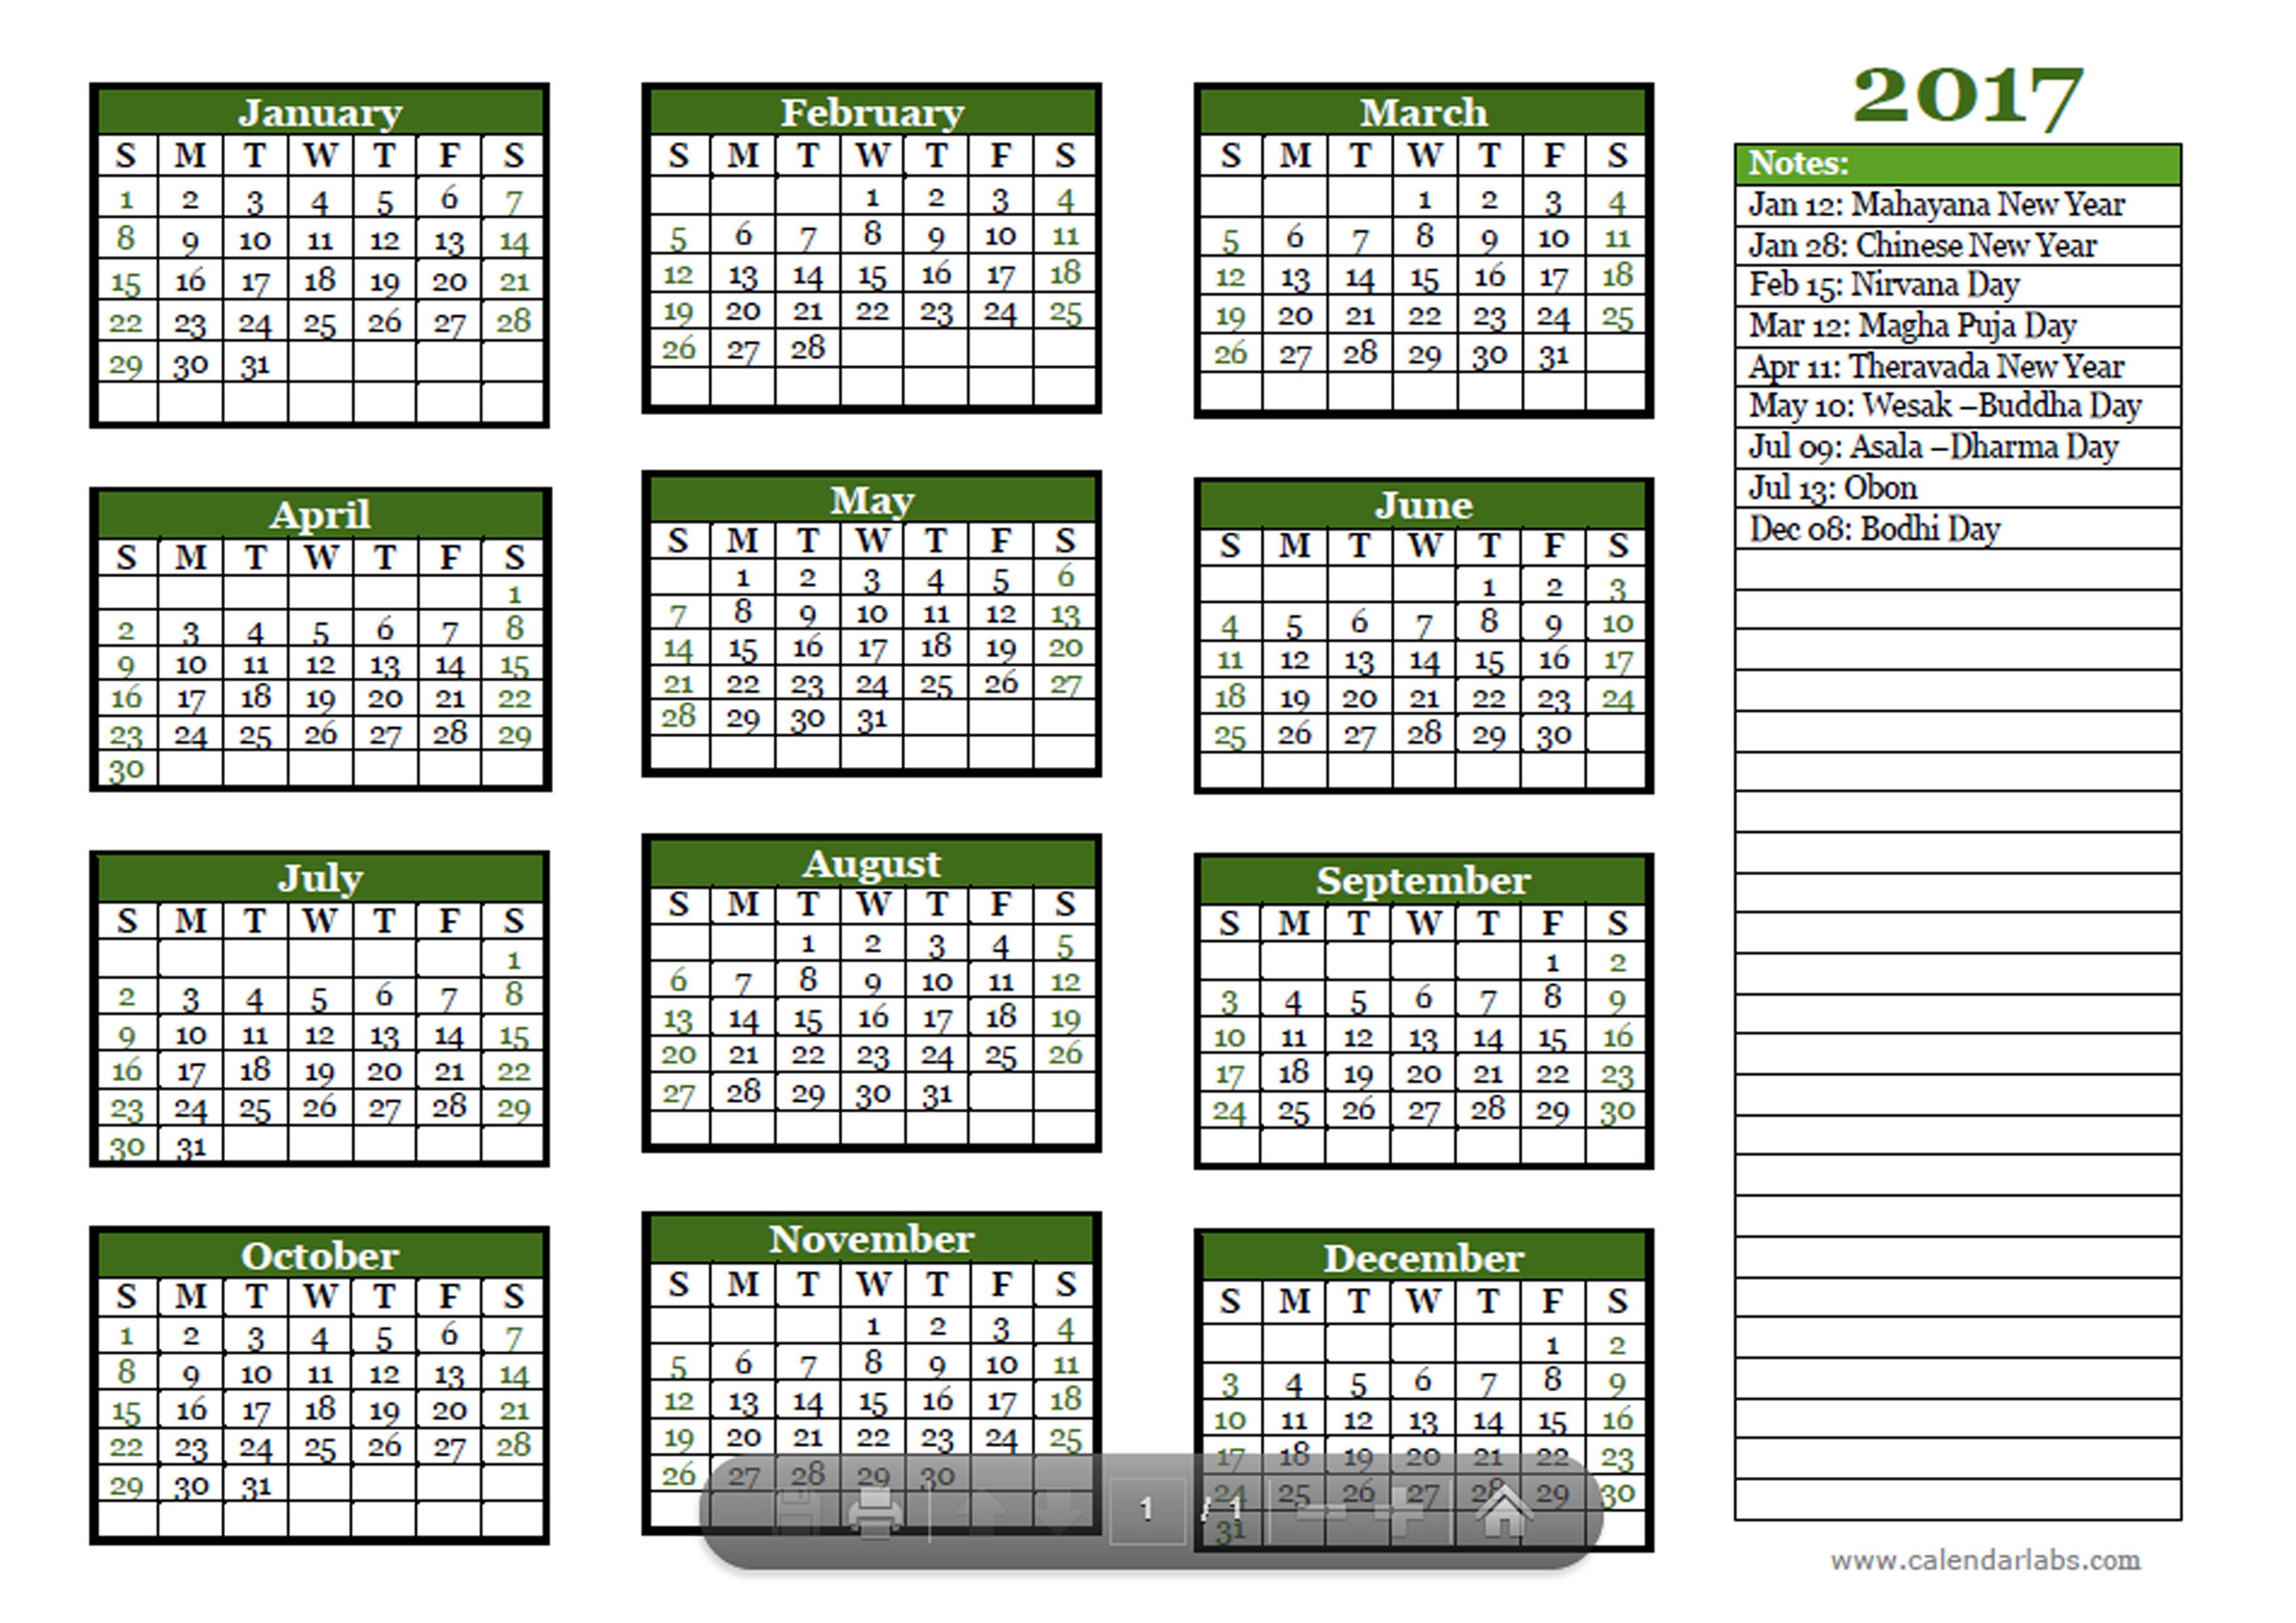 Excel Calendar Template Download Free Printable Excel 2017 Buddhist Festivals Calendar Template Free Printable